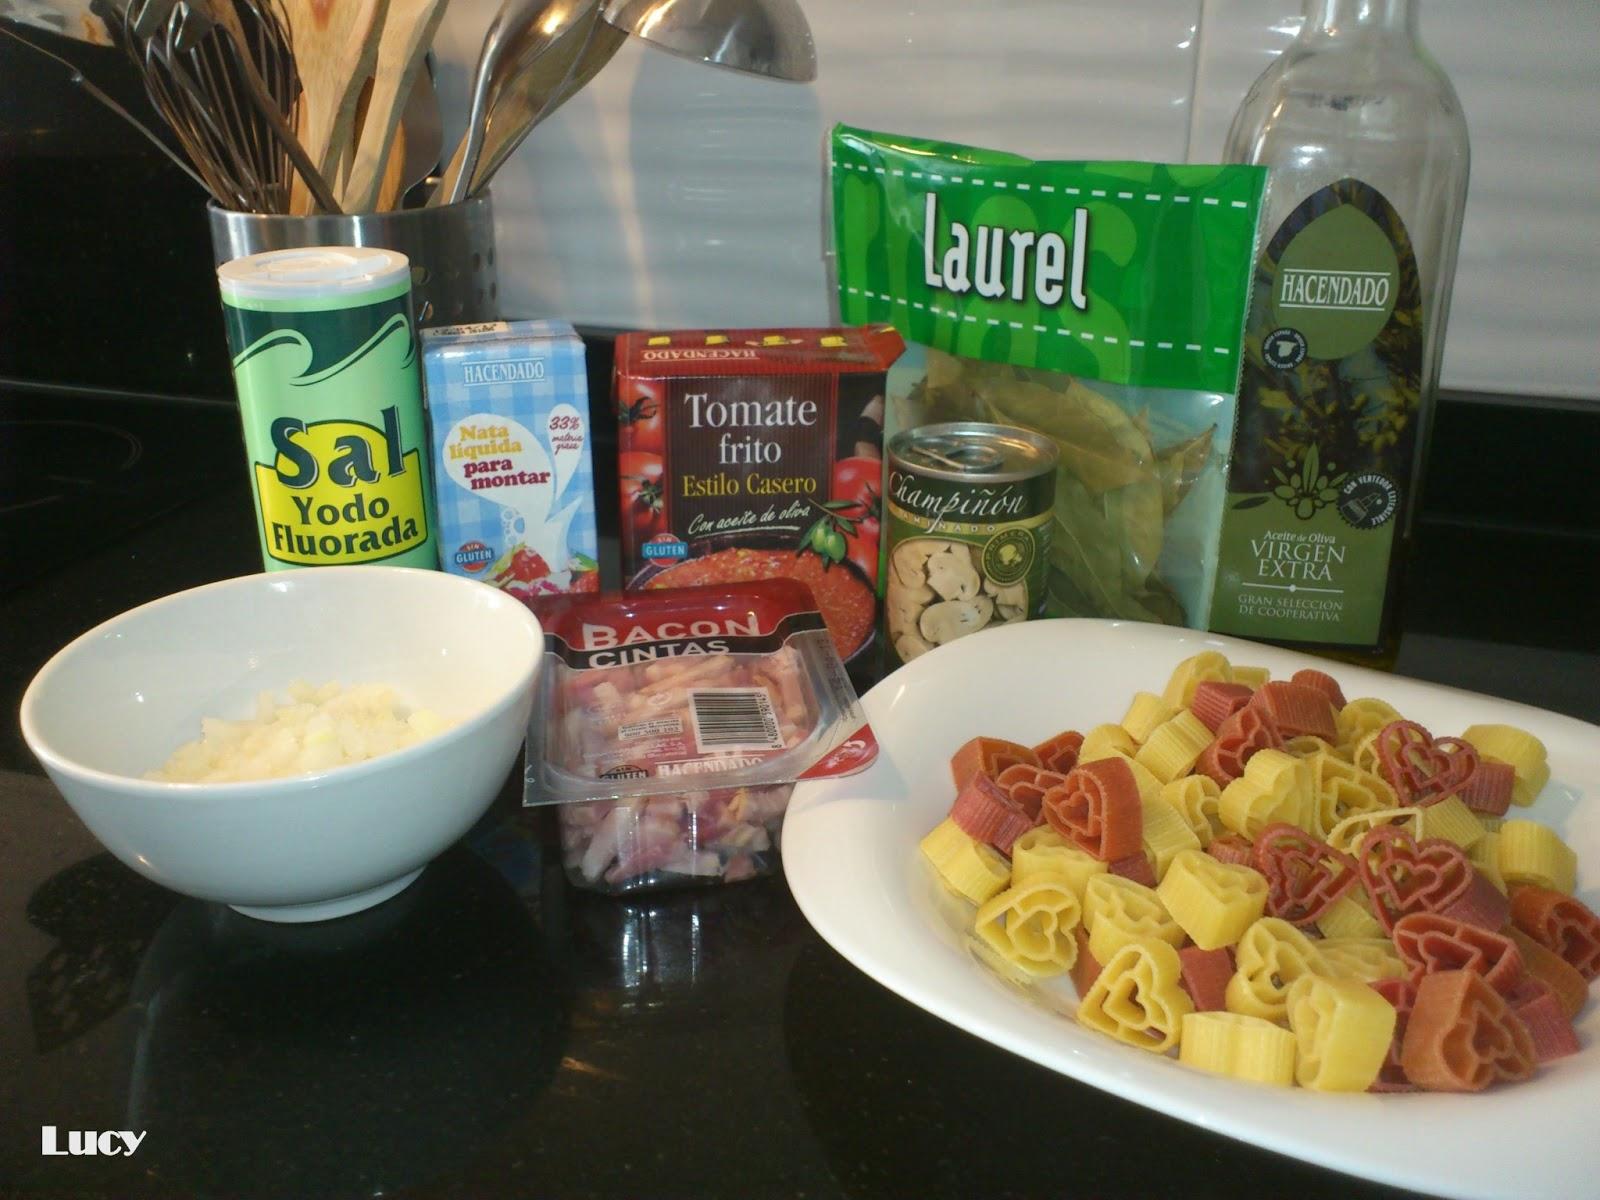 Abriendo boca con lucy pasta con salsa de nata y tomate - Salsas para pasta con nata ...